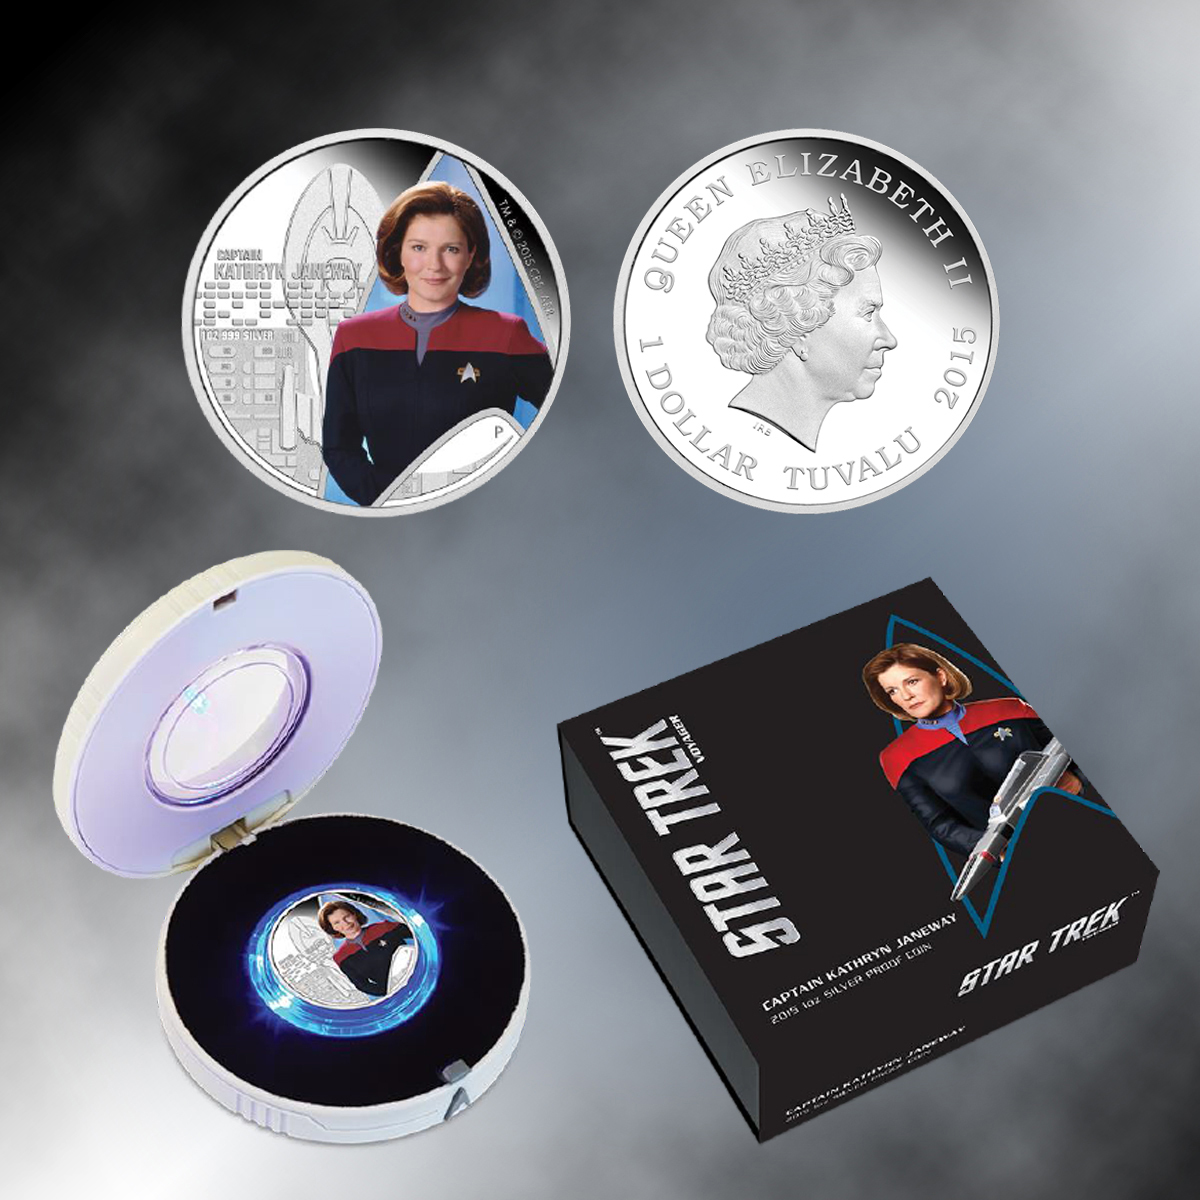 2015 Star Trek Captain Janeway Tuvalu Silver Proof